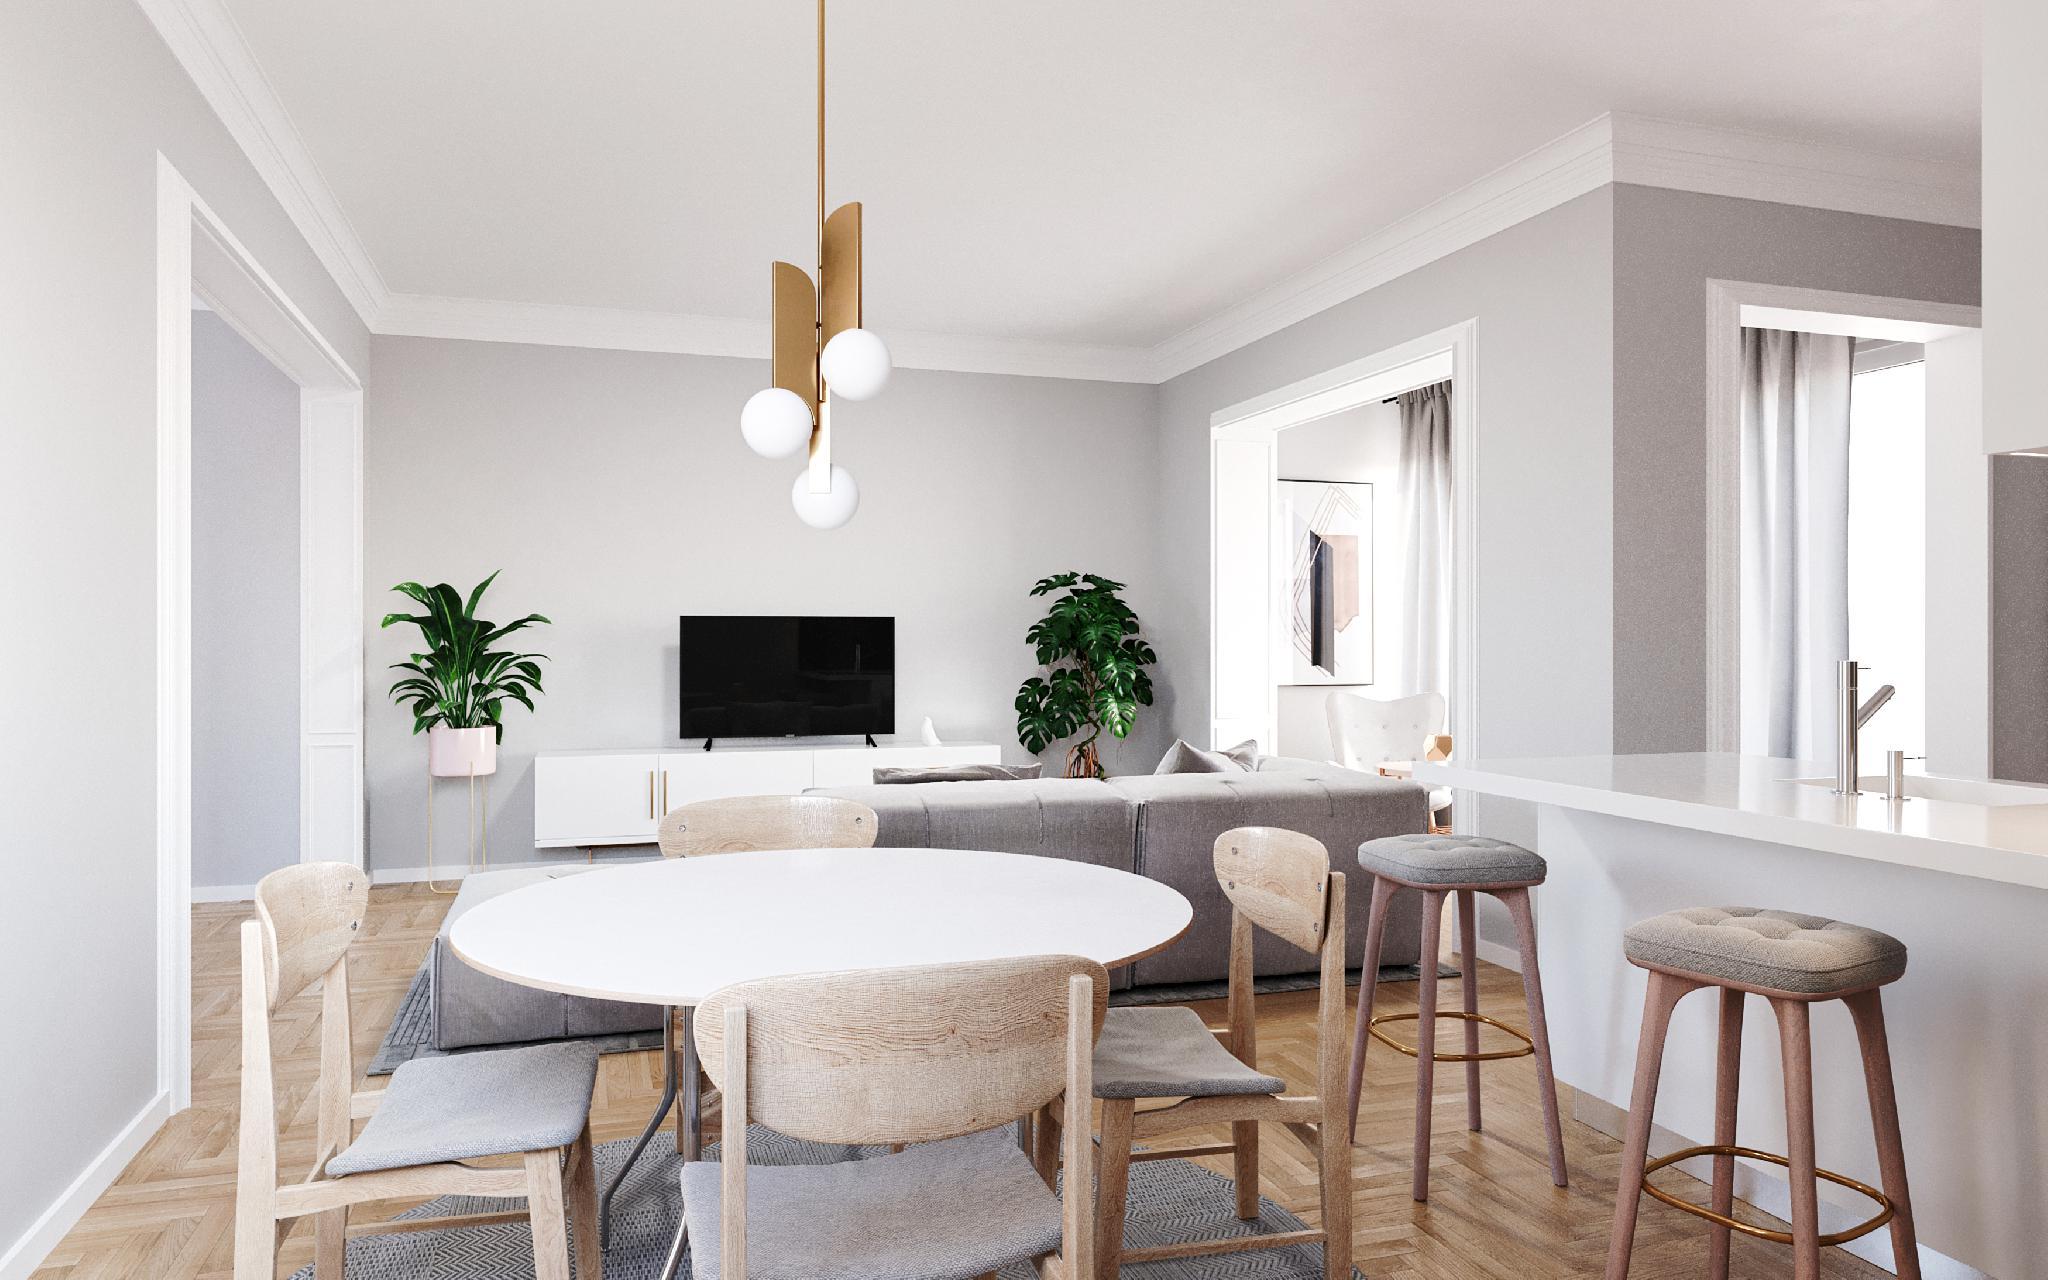 166582 Flat for sale in Eixample, Dreta Eixample 2